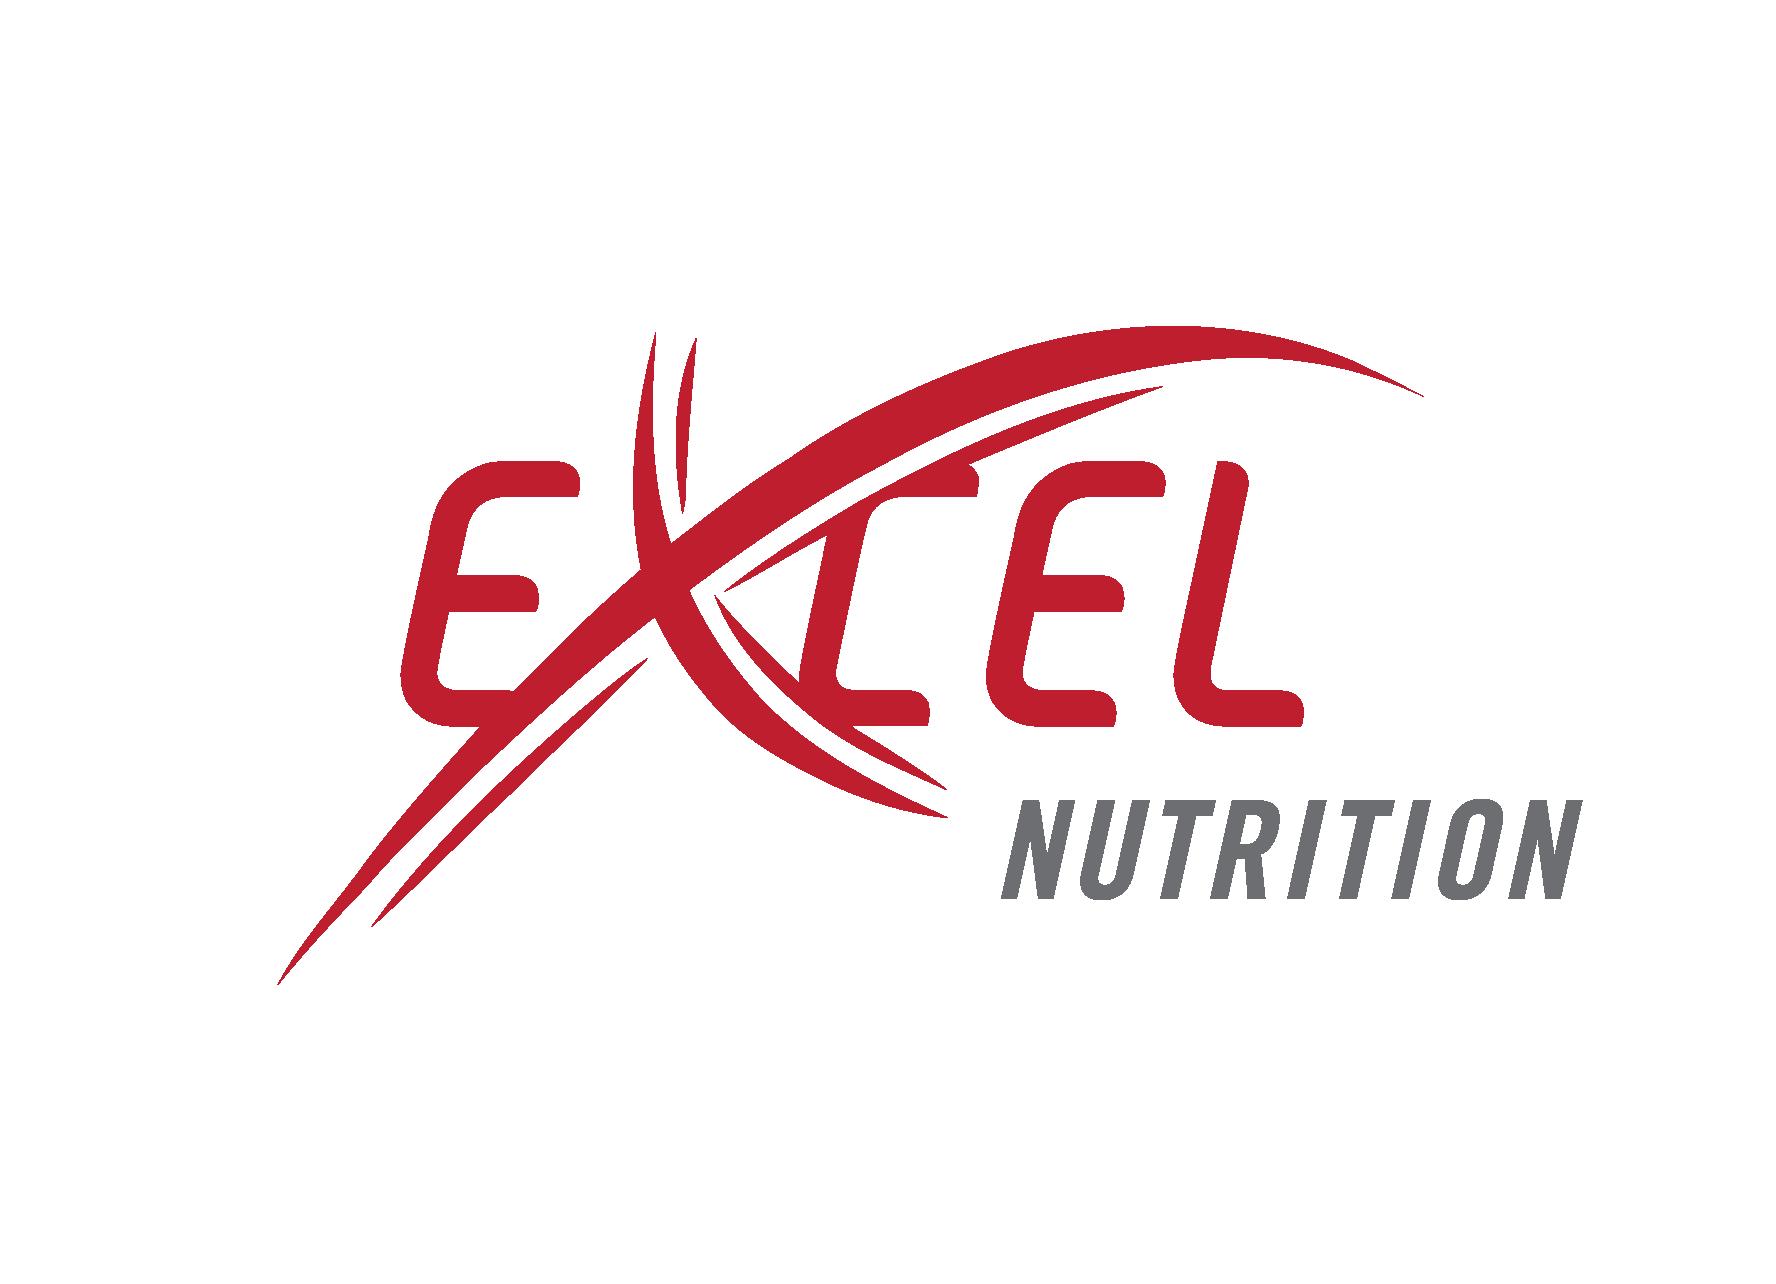 Excel_HF_Lockup_NUTRITION.png